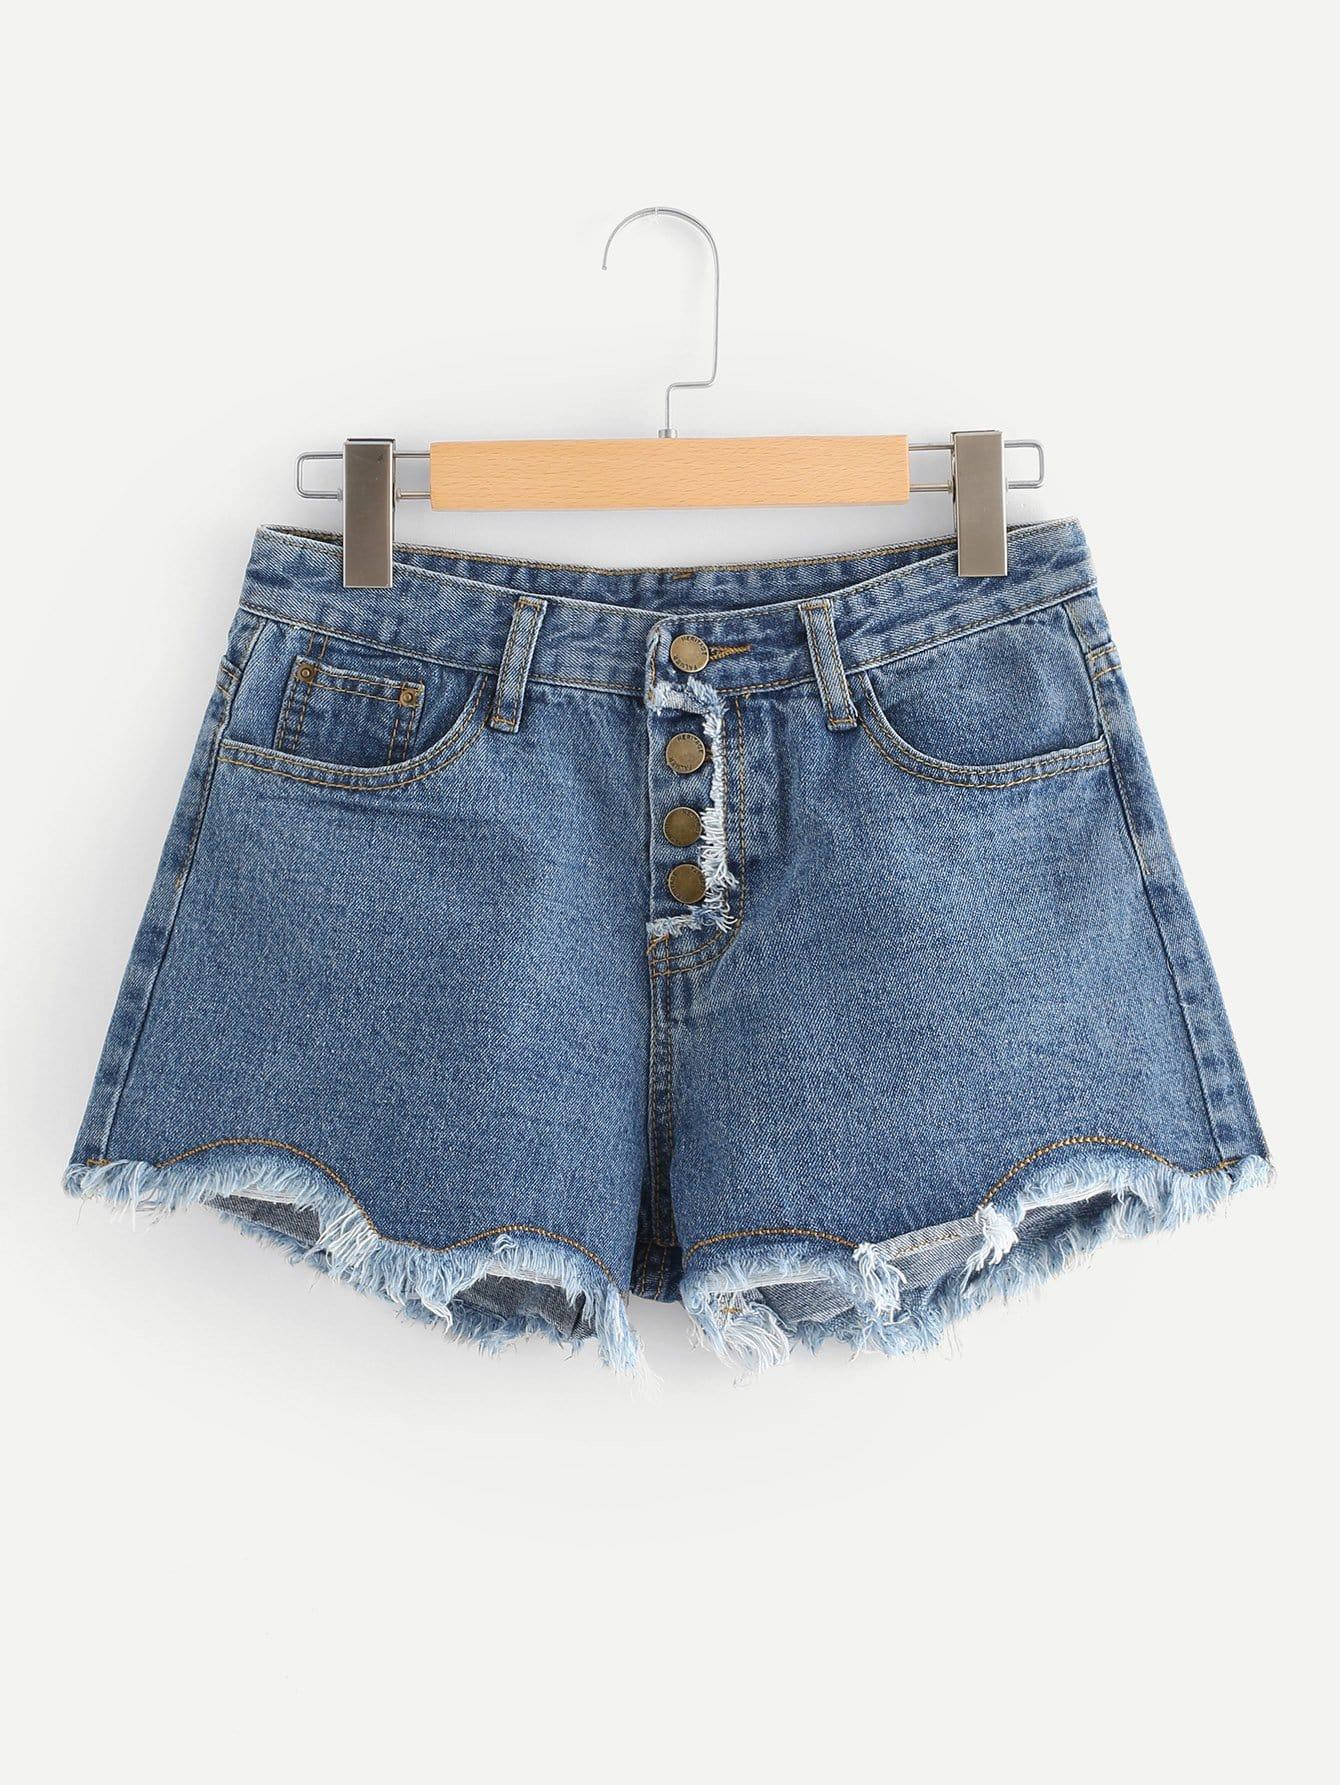 Raw Hem Denim Shorts sweet wavy hem design striped shorts for women